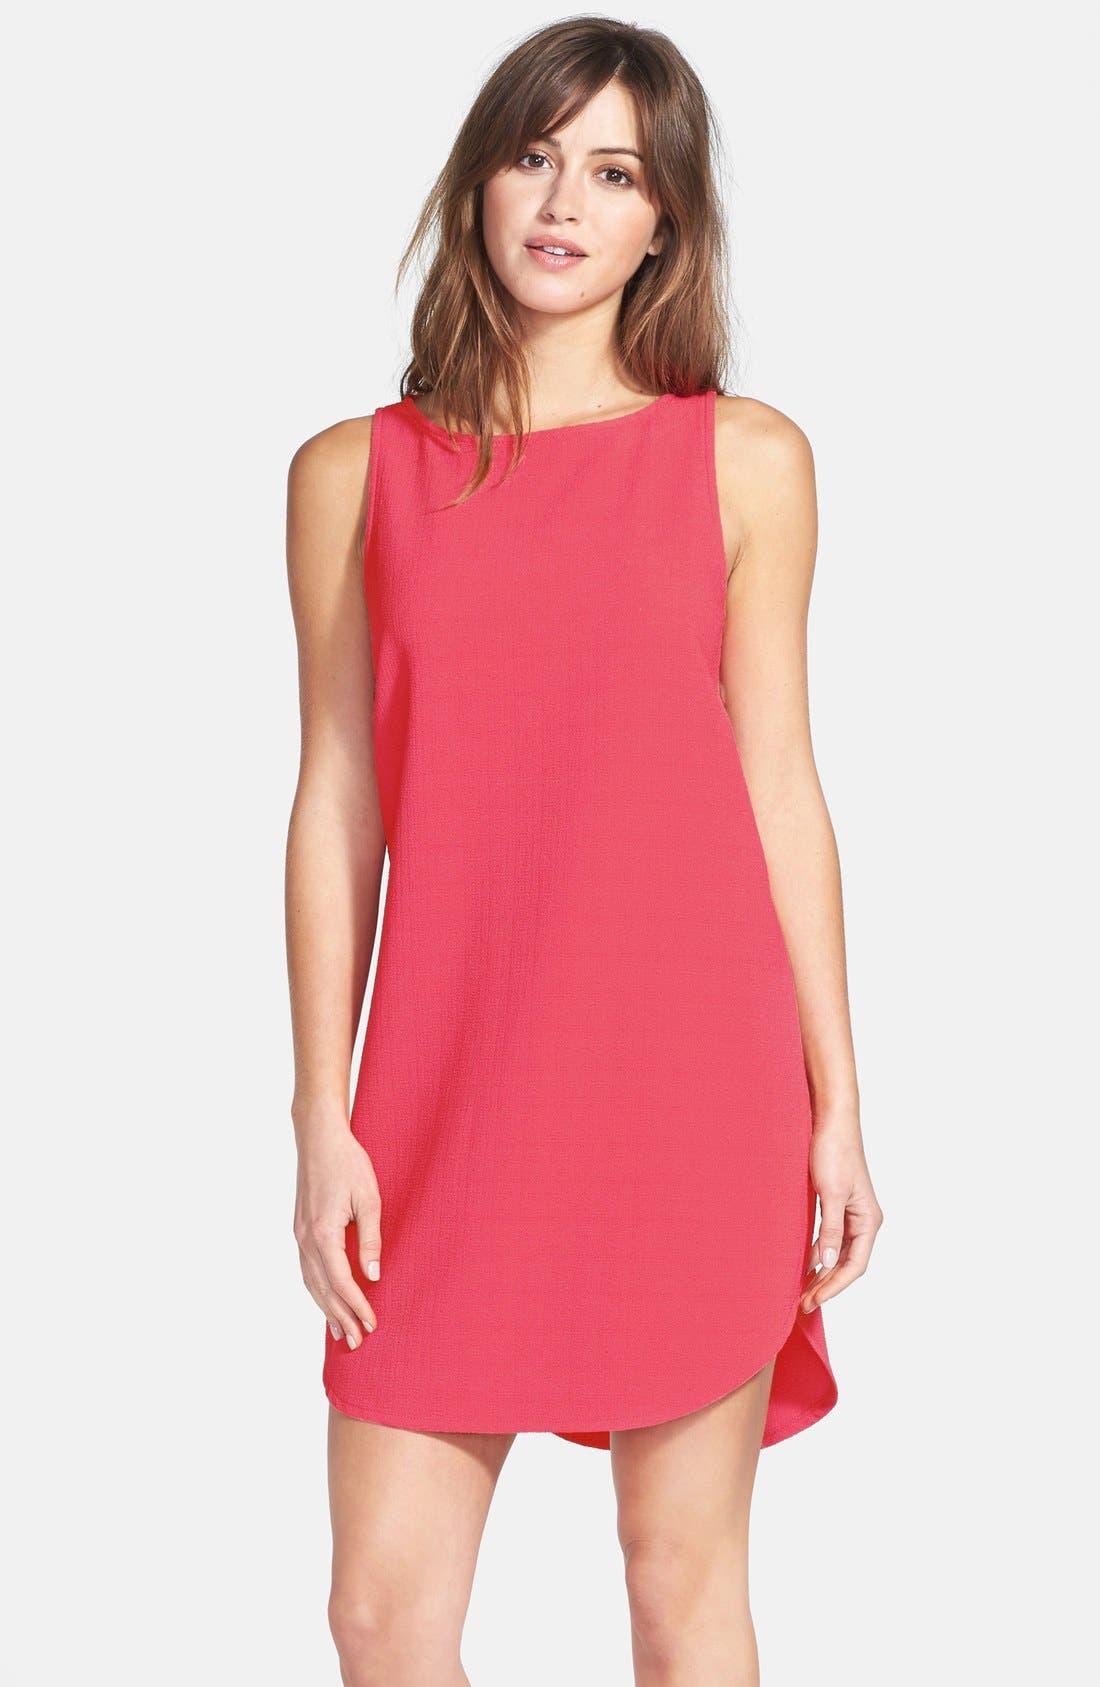 Alternate Image 1 Selected - BB Dakota 'Mariam' Cutout Back Textured Dress